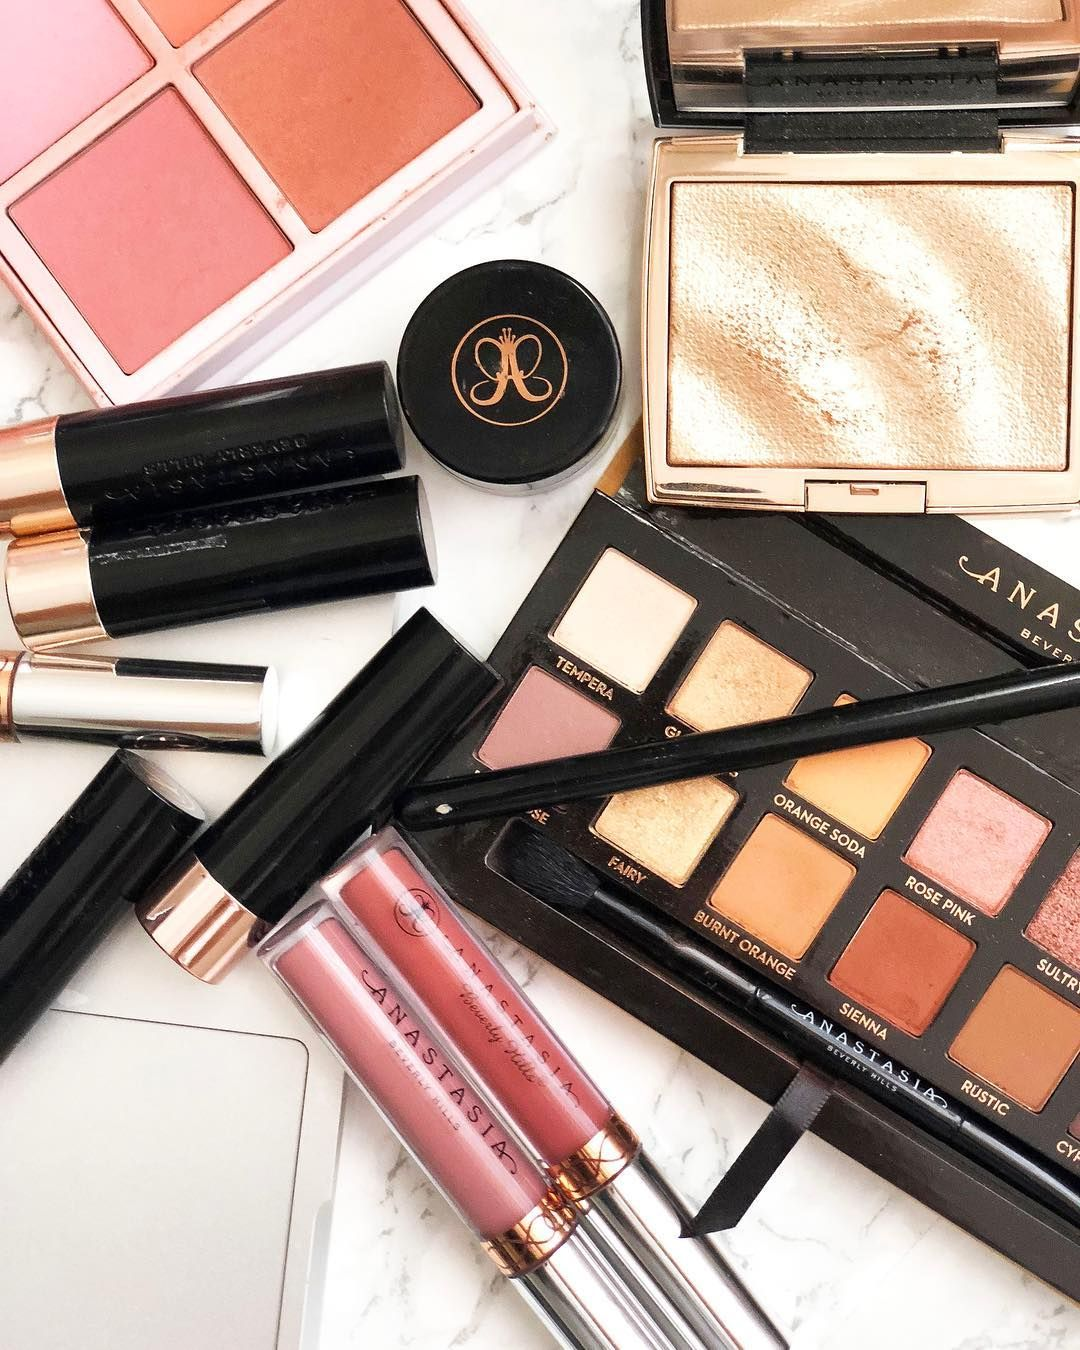 Anastasia Beverly Hills Novina Palette + Liquid Lipsticks #makeup #lipstick